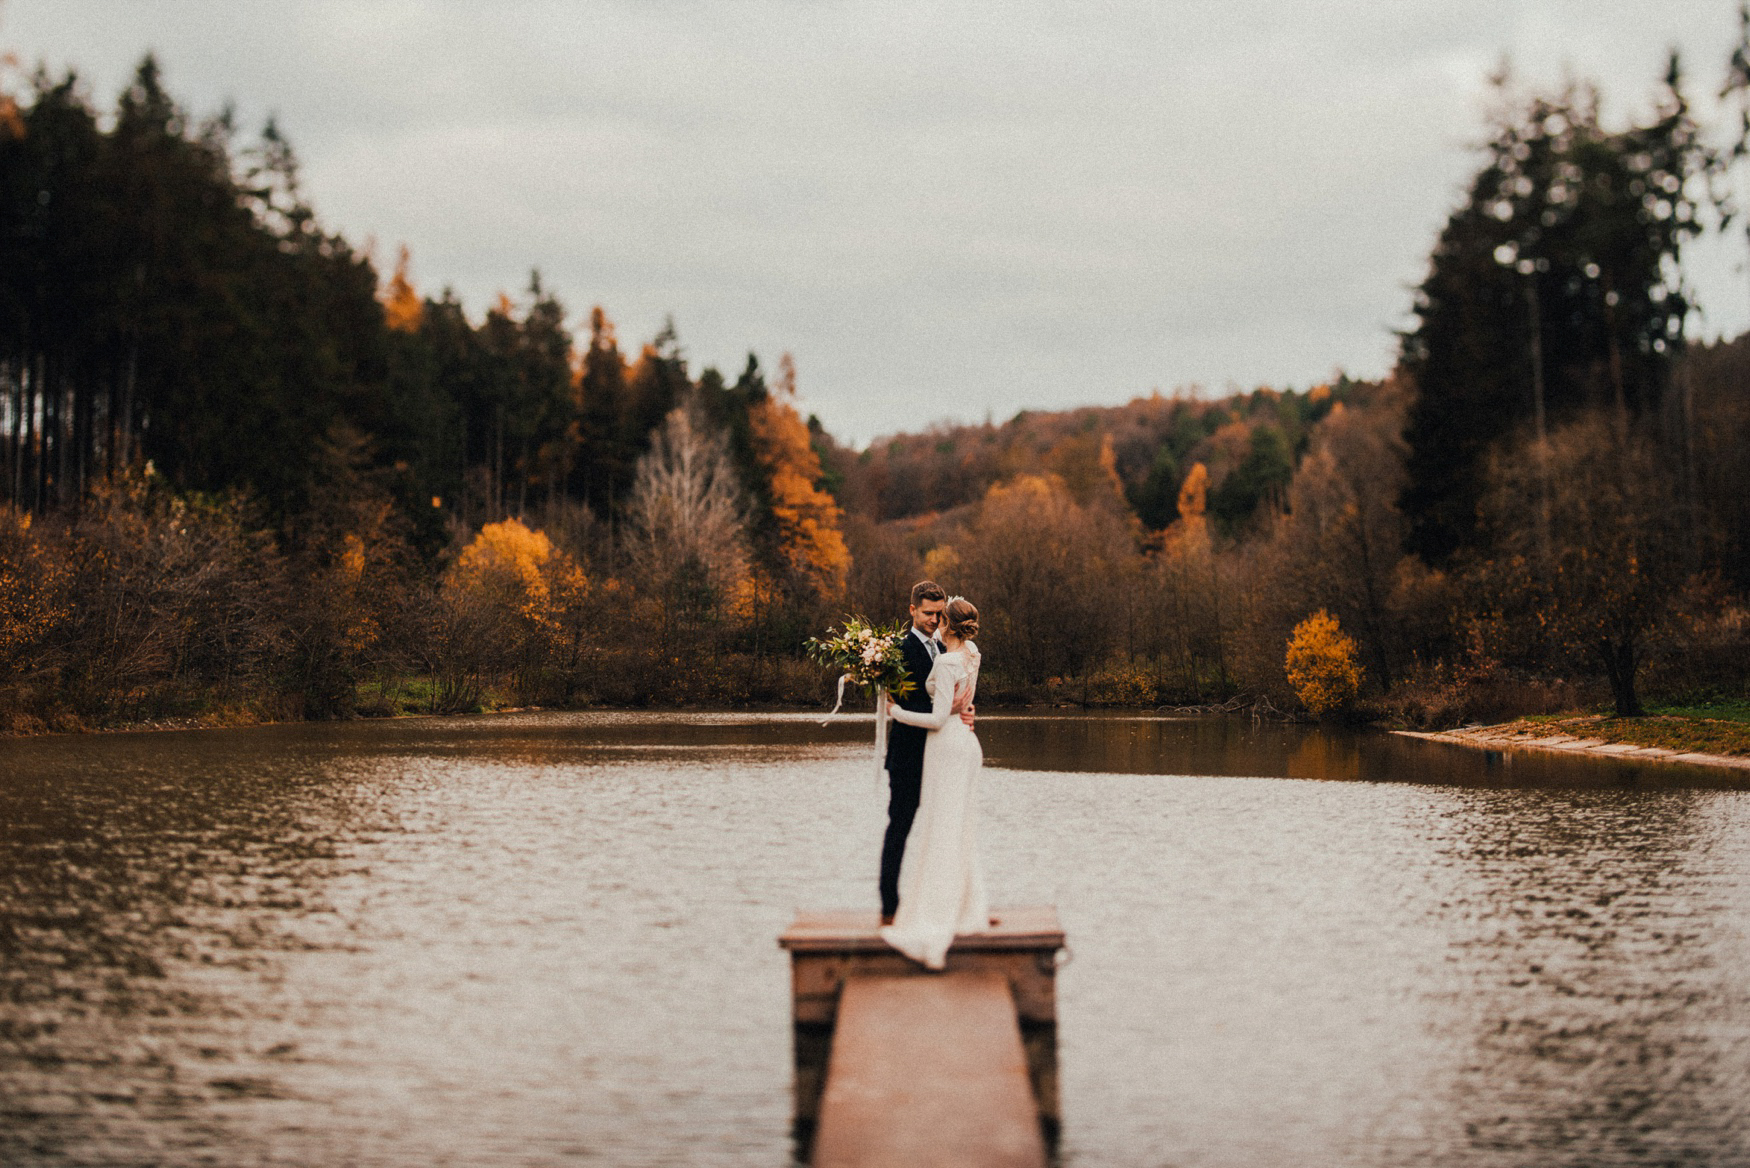 3 czech countryside rustic wedding - svatba zikmundov009.jpg